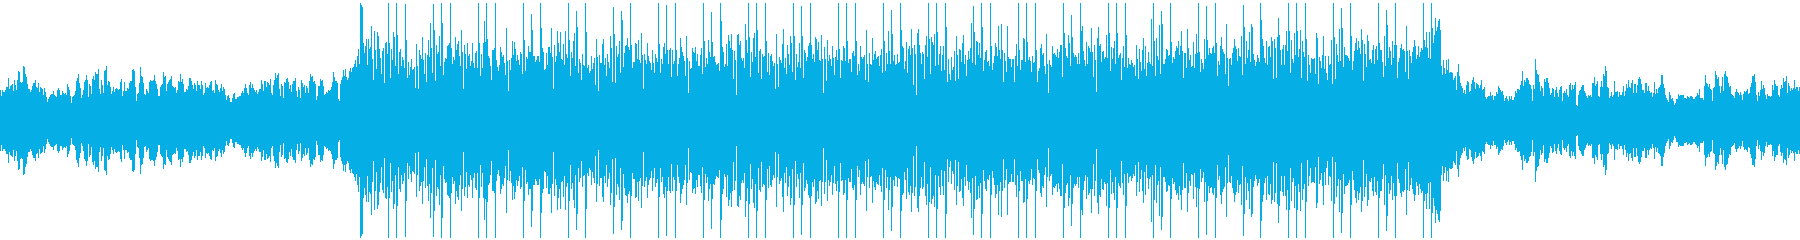 Cyber, dark techno trance's reproduced waveform